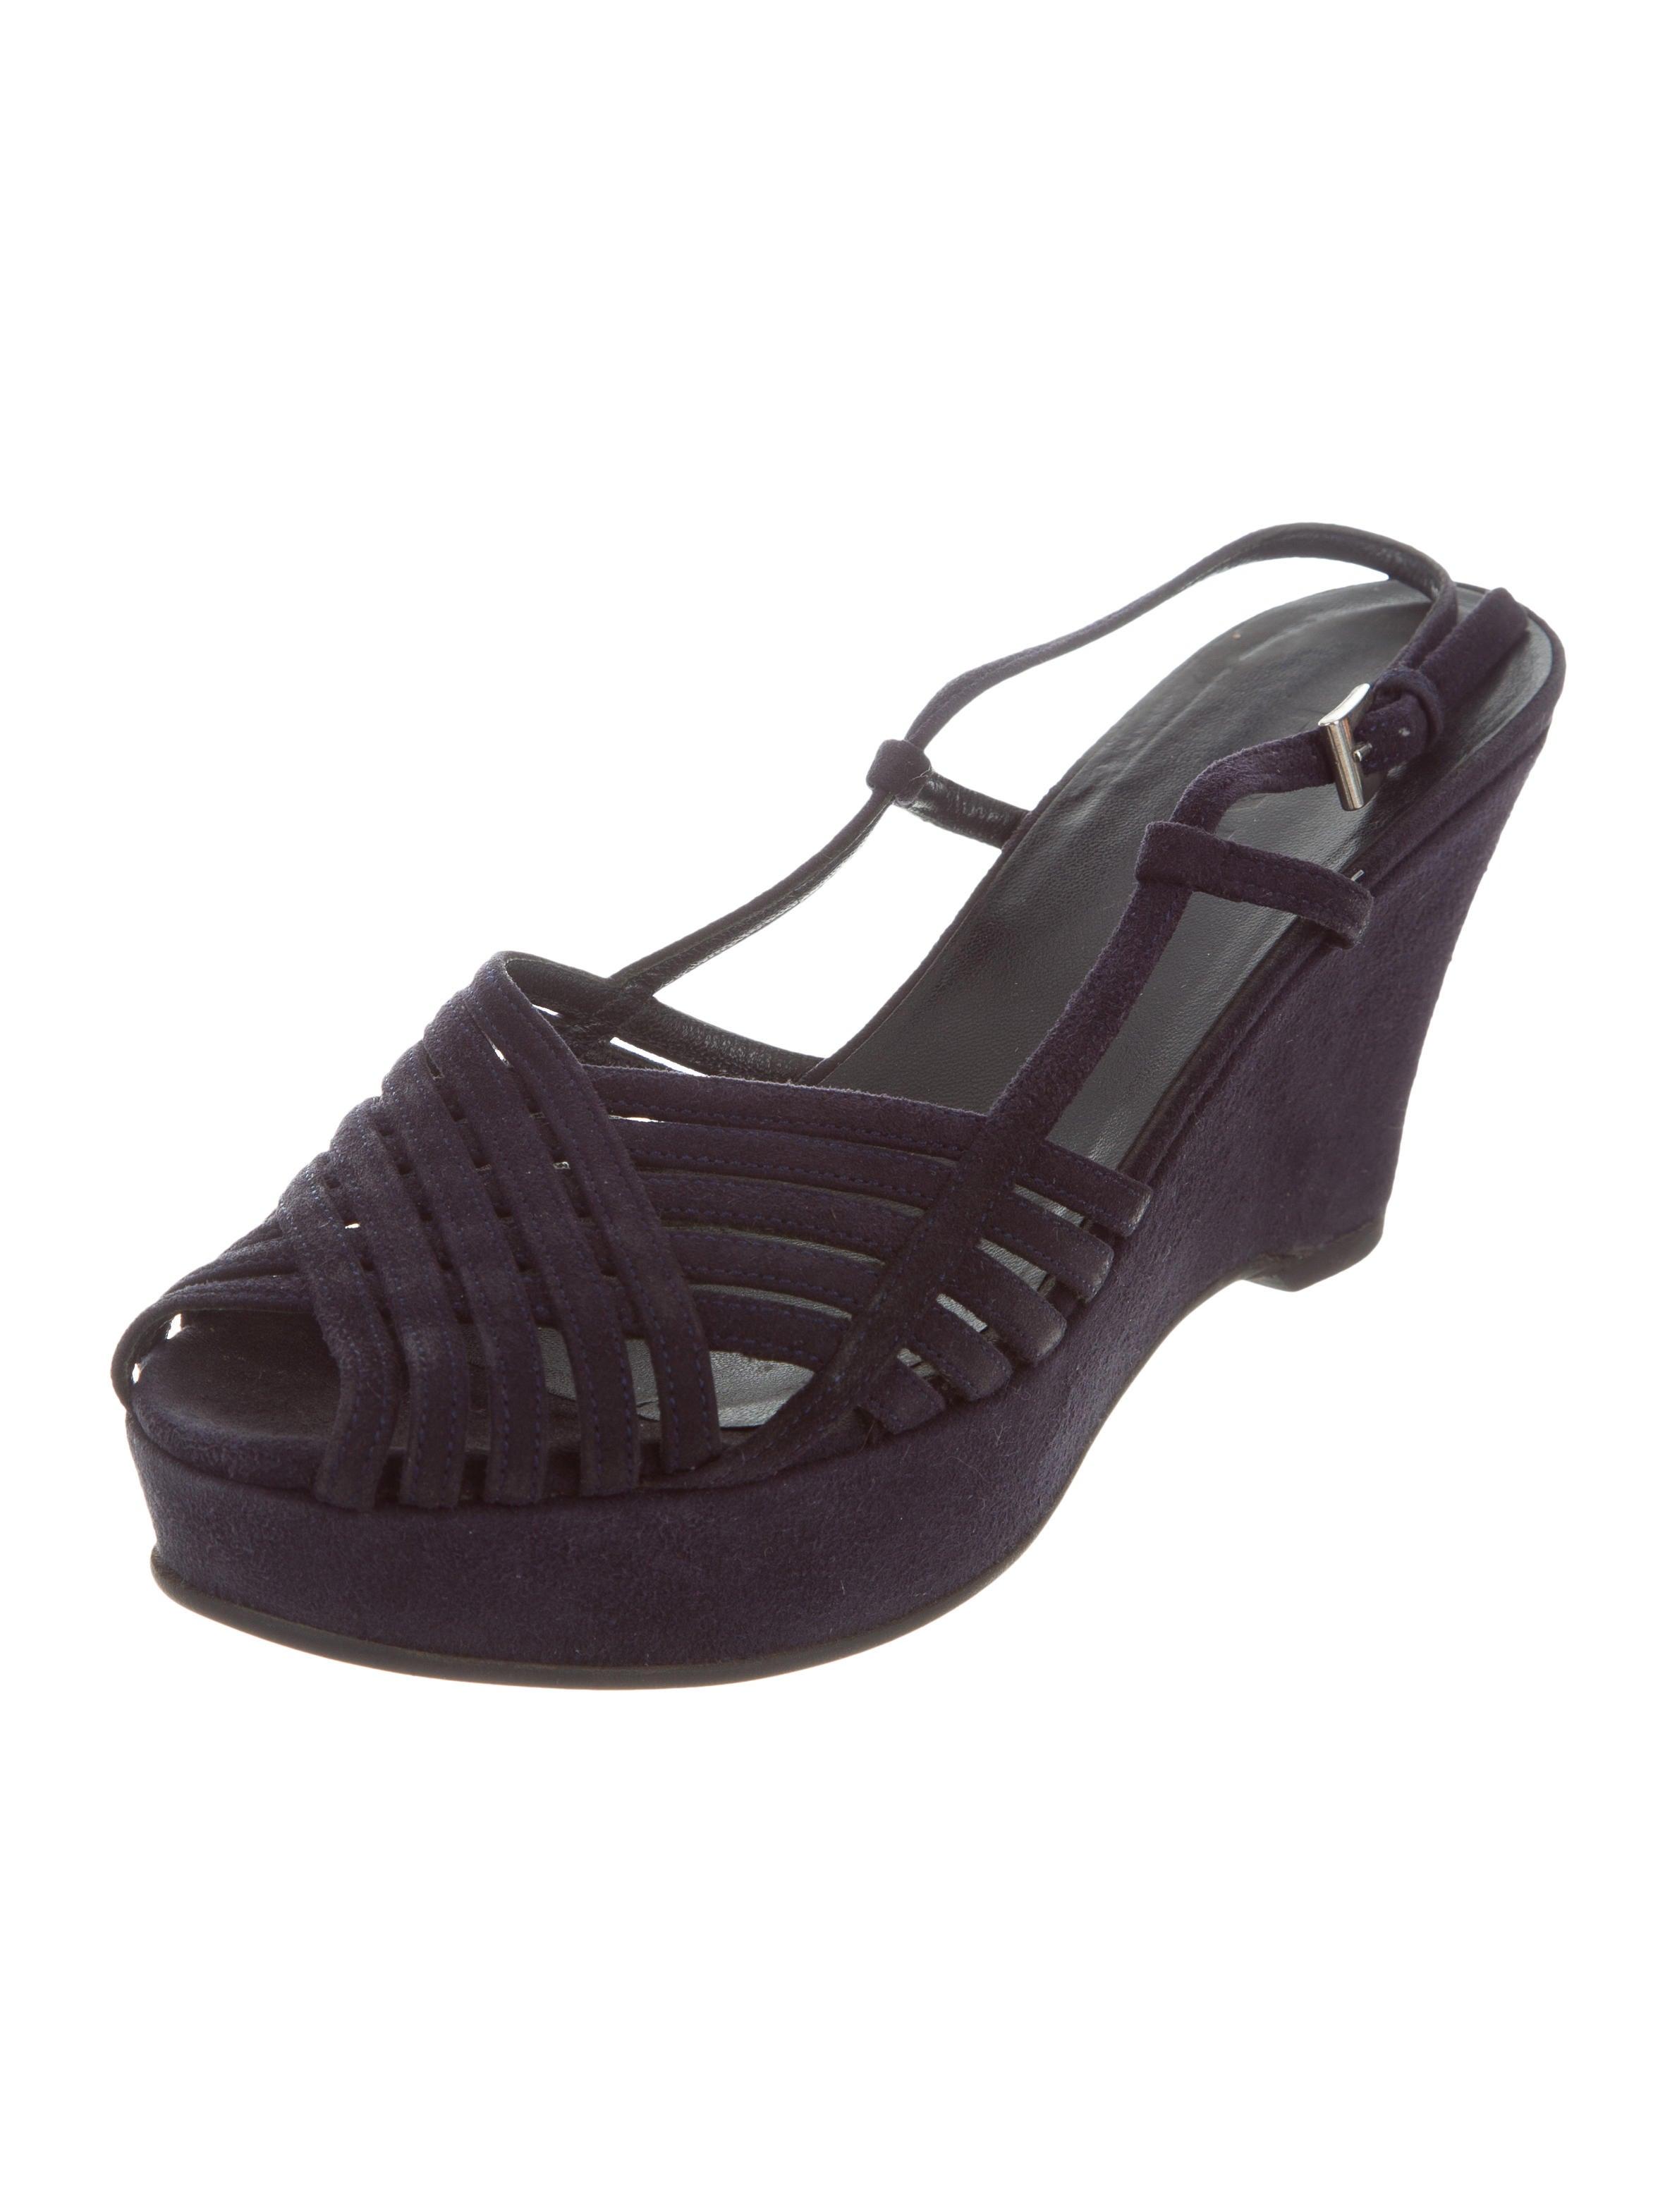 prada suede platform wedge sandals shoes pra154306